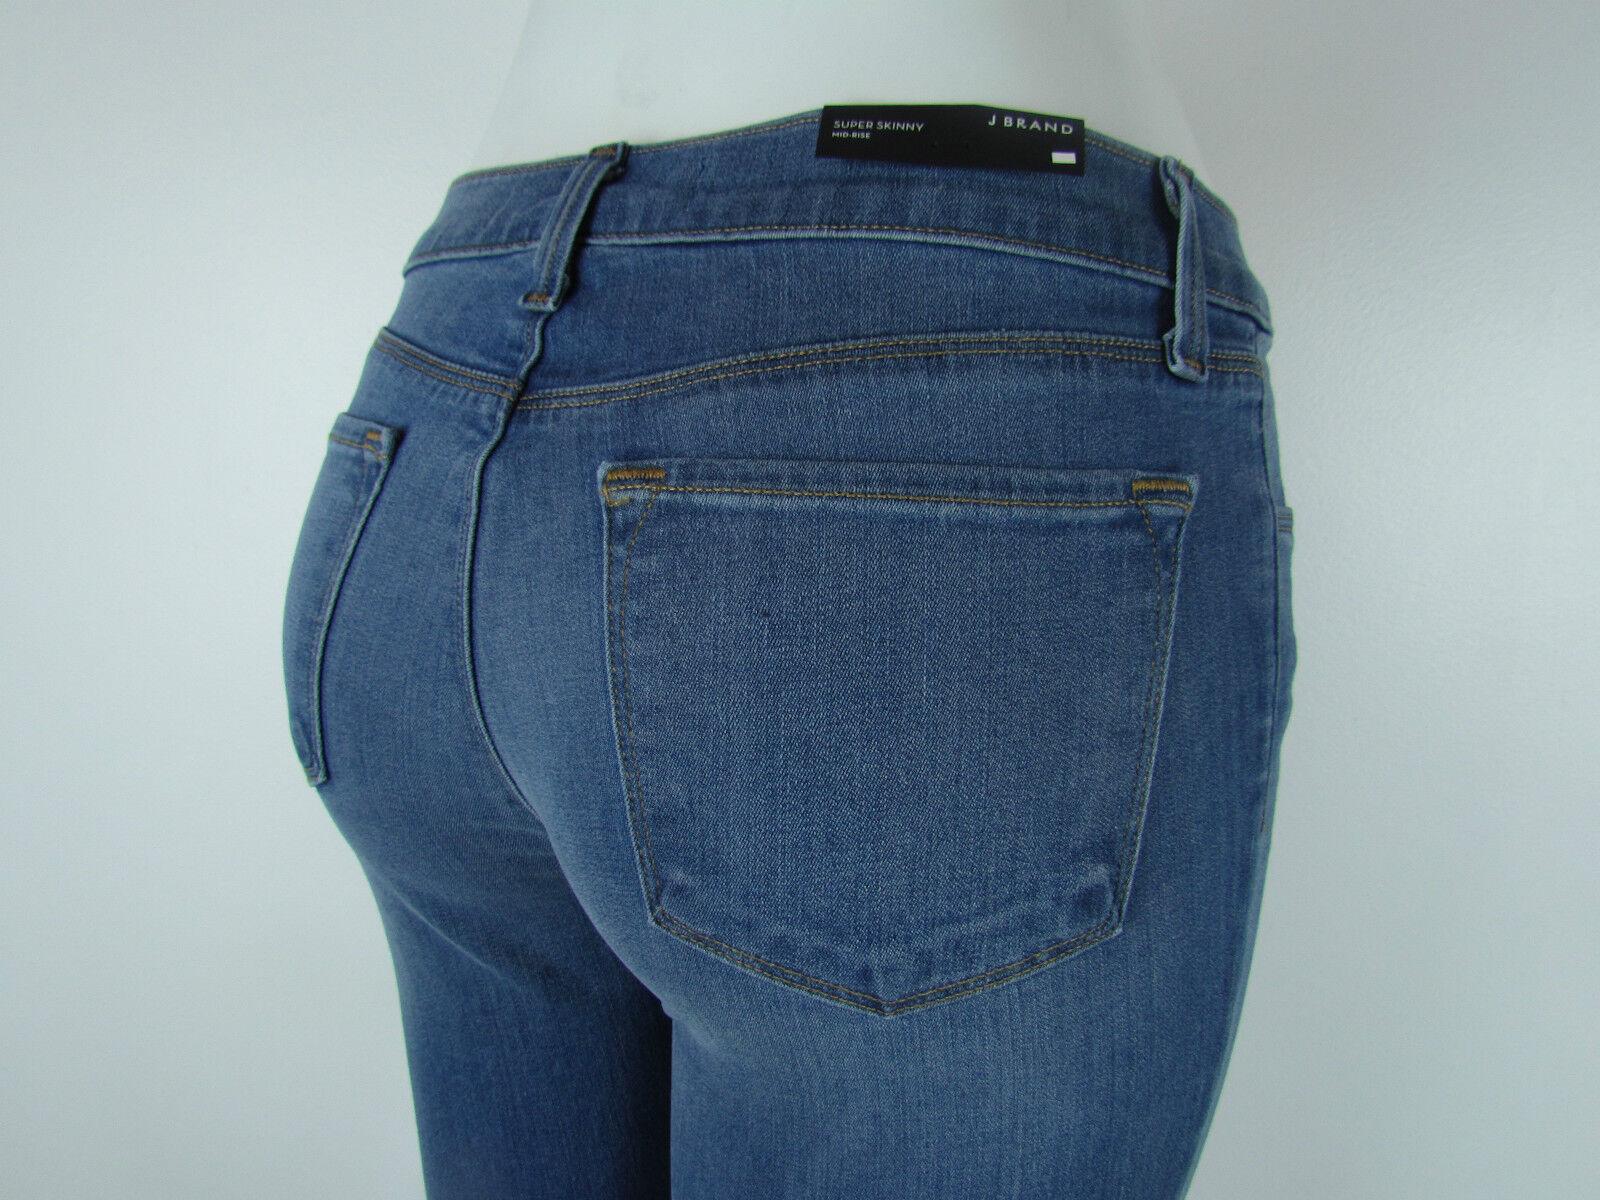 New J BRAND 620 SUPER SKINNY Mid Rise Jeans Woman SZ 27 IN LUCAS MEDIUM blueE